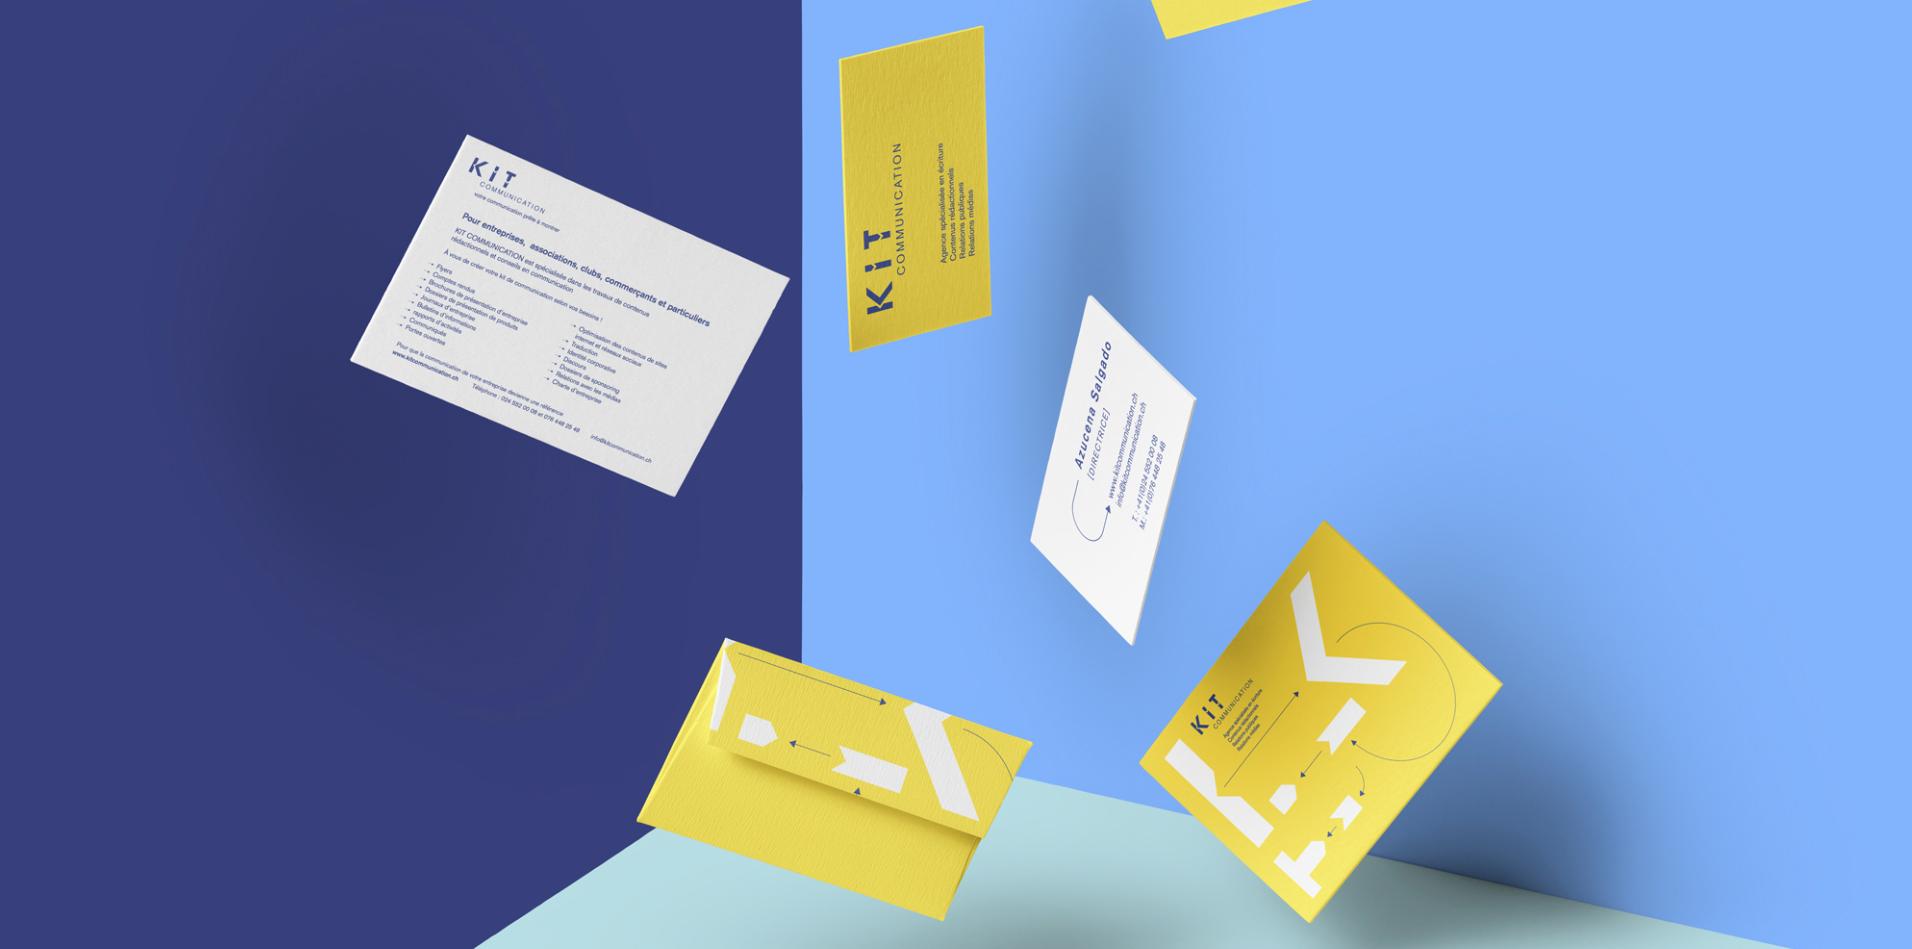 las_branding_agence-de-communication-lausanne.jpg